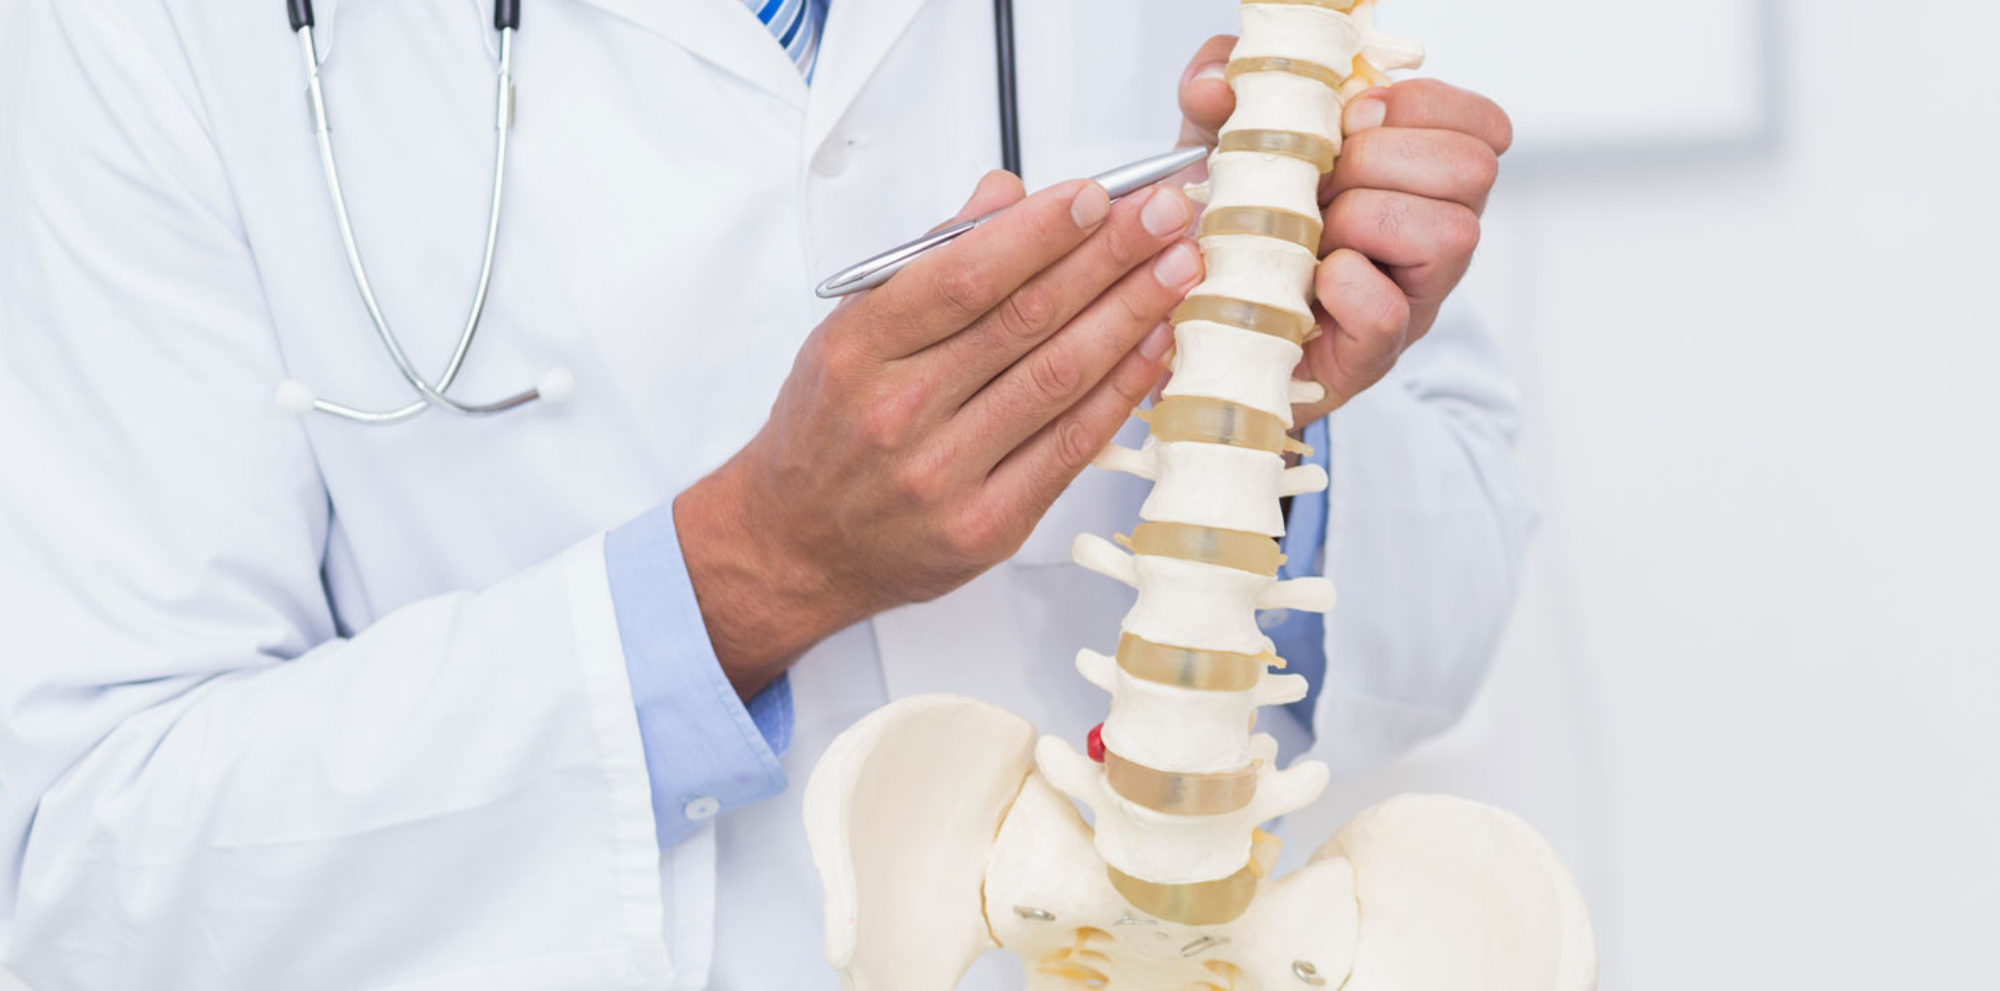 Dr L.E. Schmidt | Chiropractor